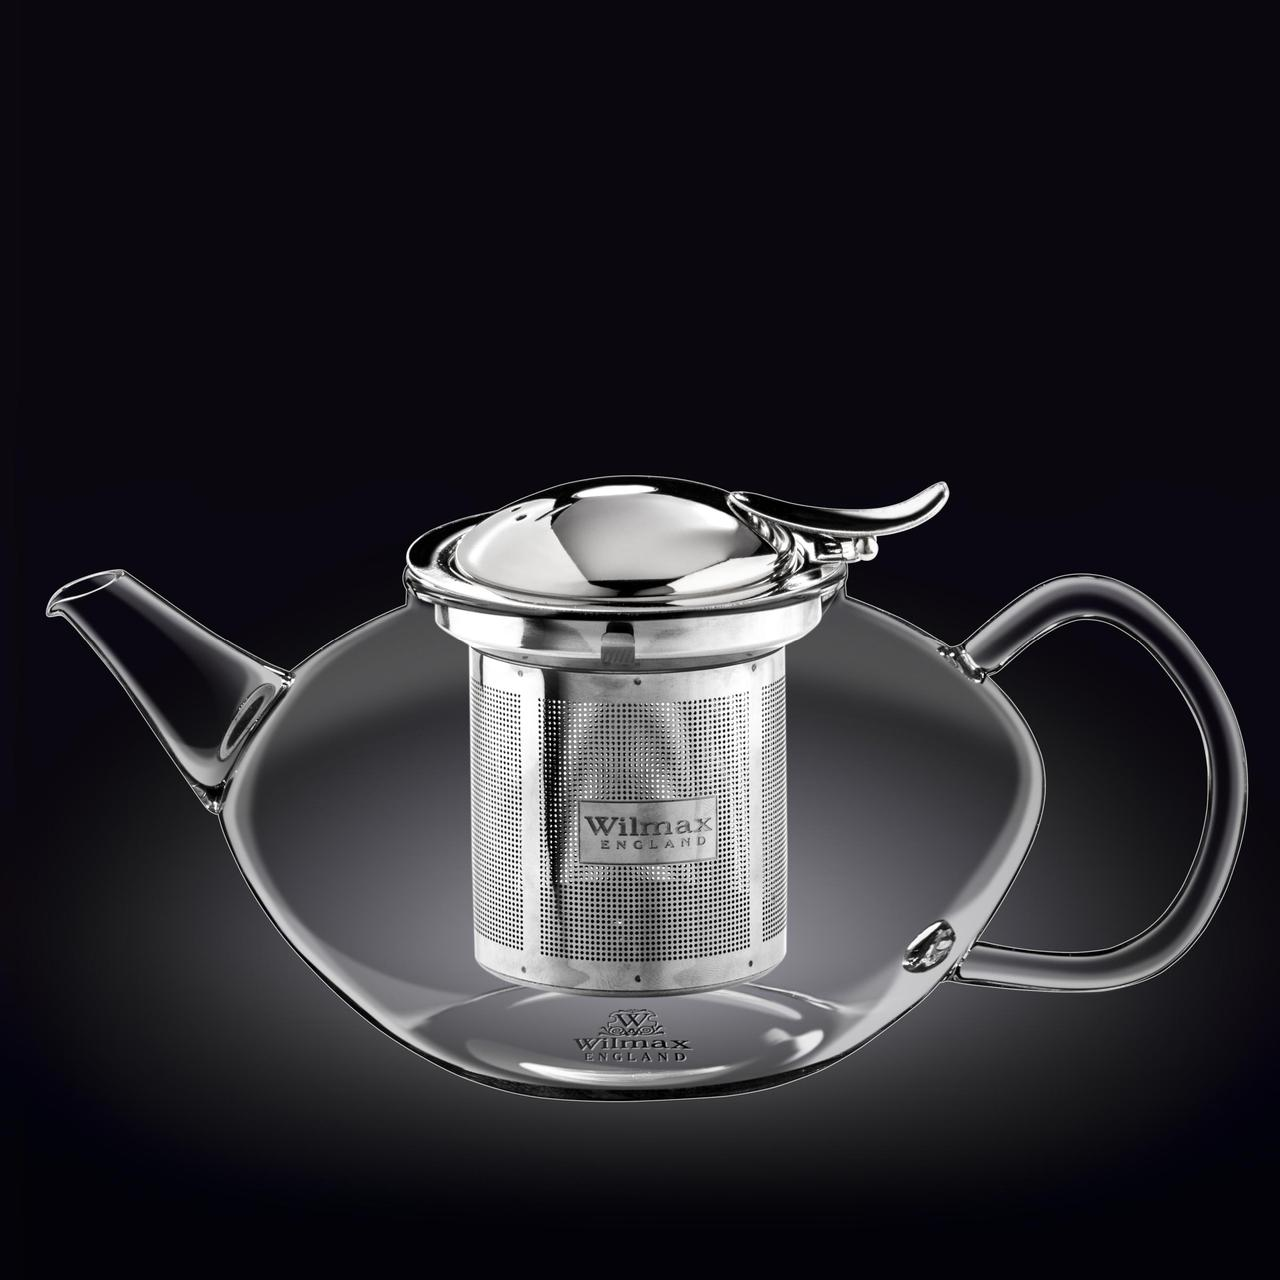 Заварочный чайник с ситечком Wilmax Thermo Glass 1550 мл